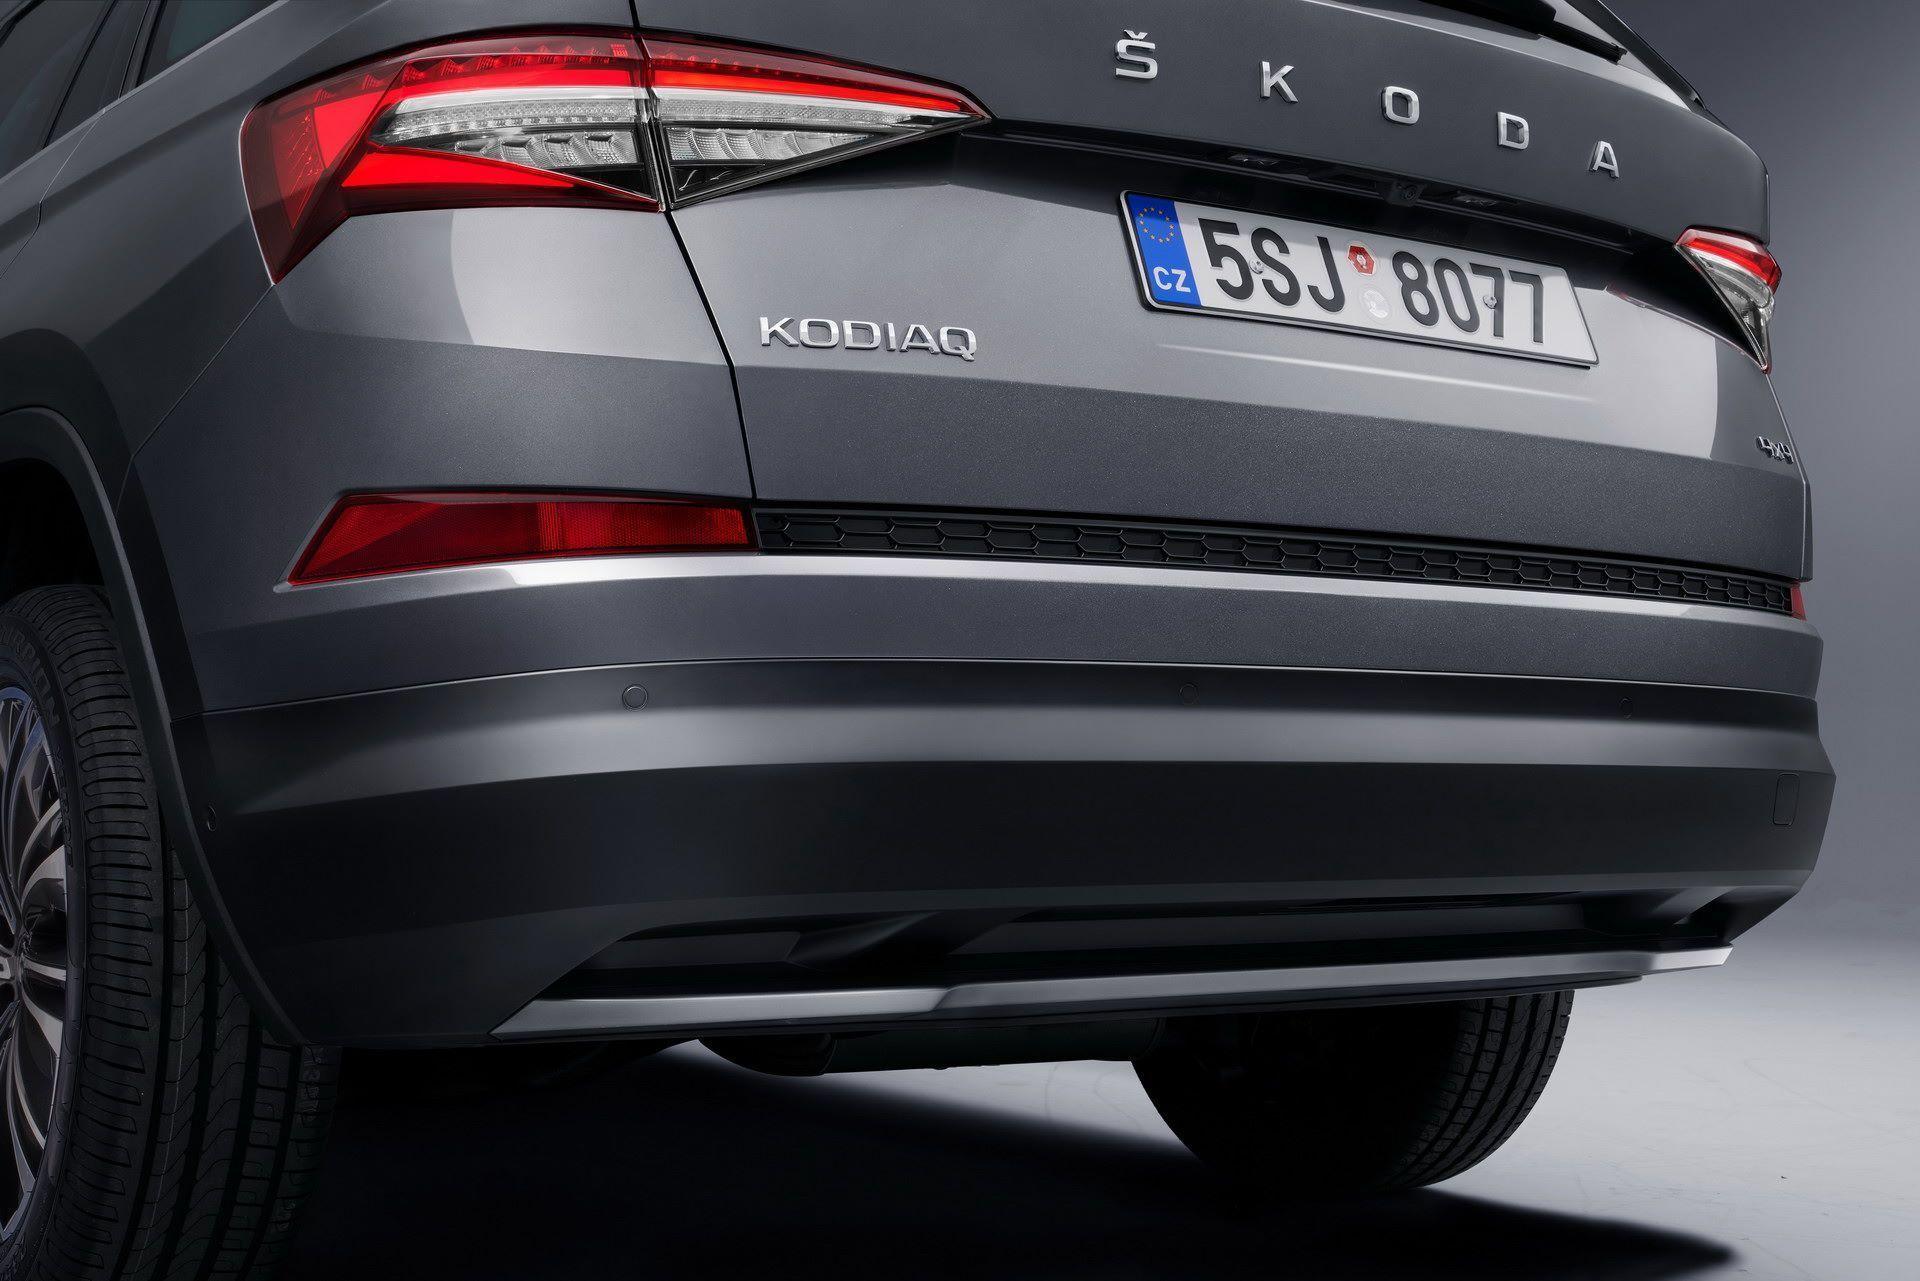 Skoda-Kodiaq-facelift-2021-16